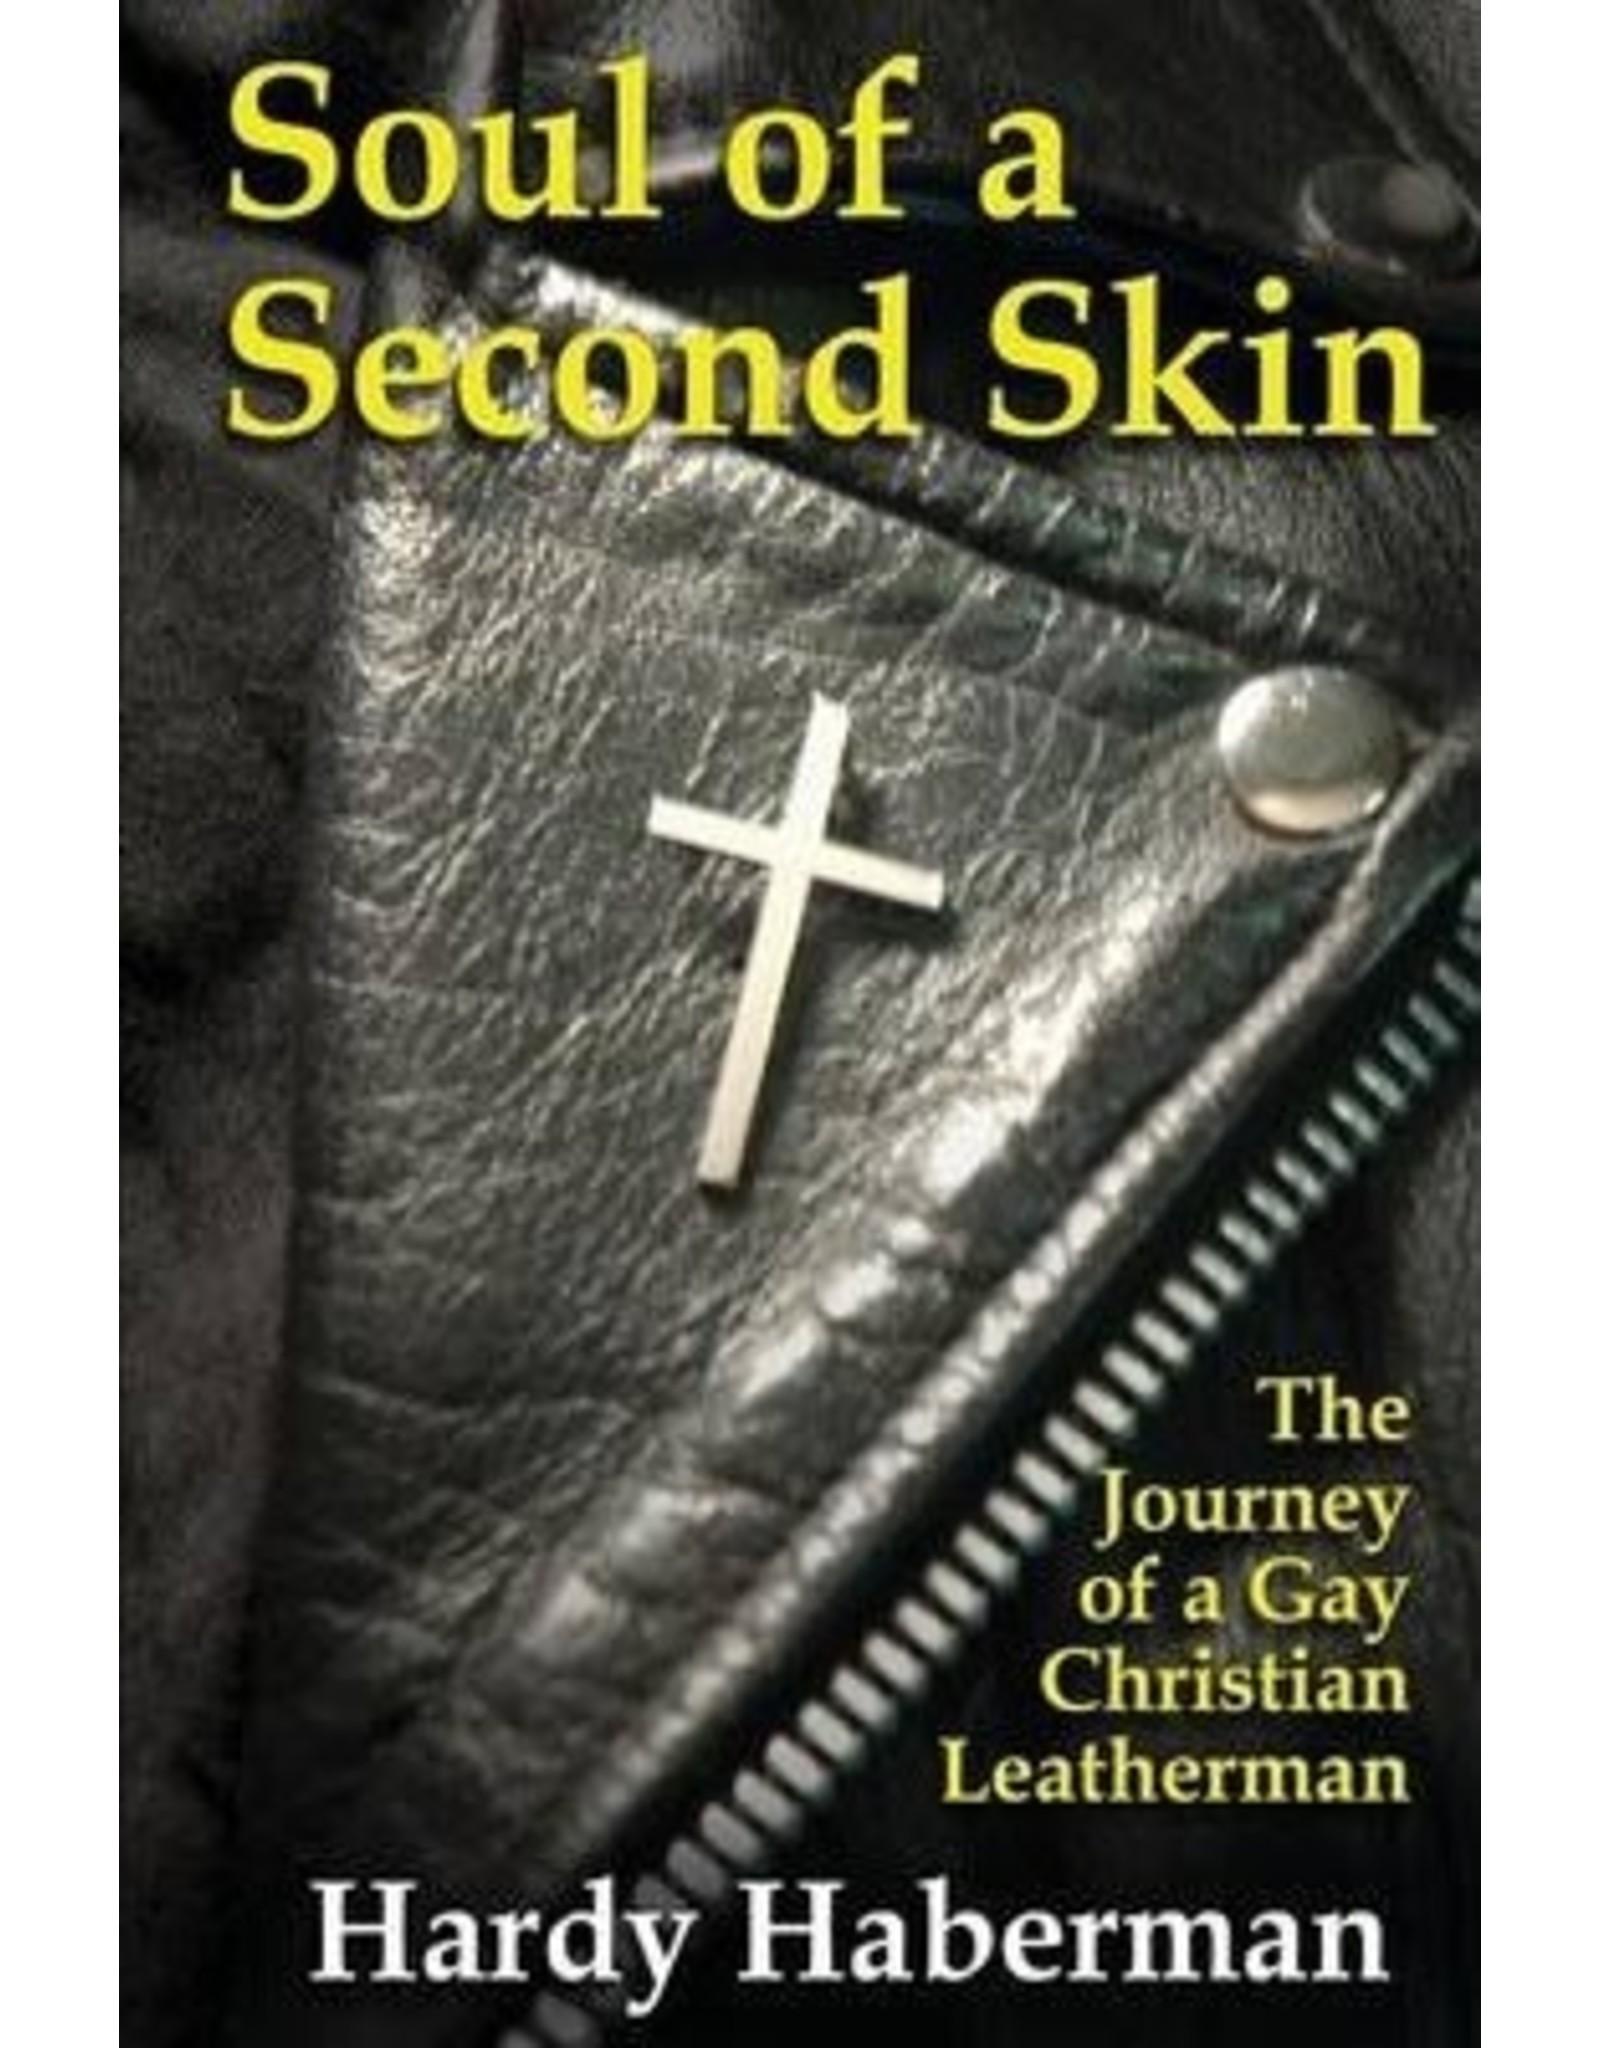 Nazca Plains Nazca Plains Soul of a Second Skin : The Journey of a Gay Christian Leatherman by Hardy Haberman